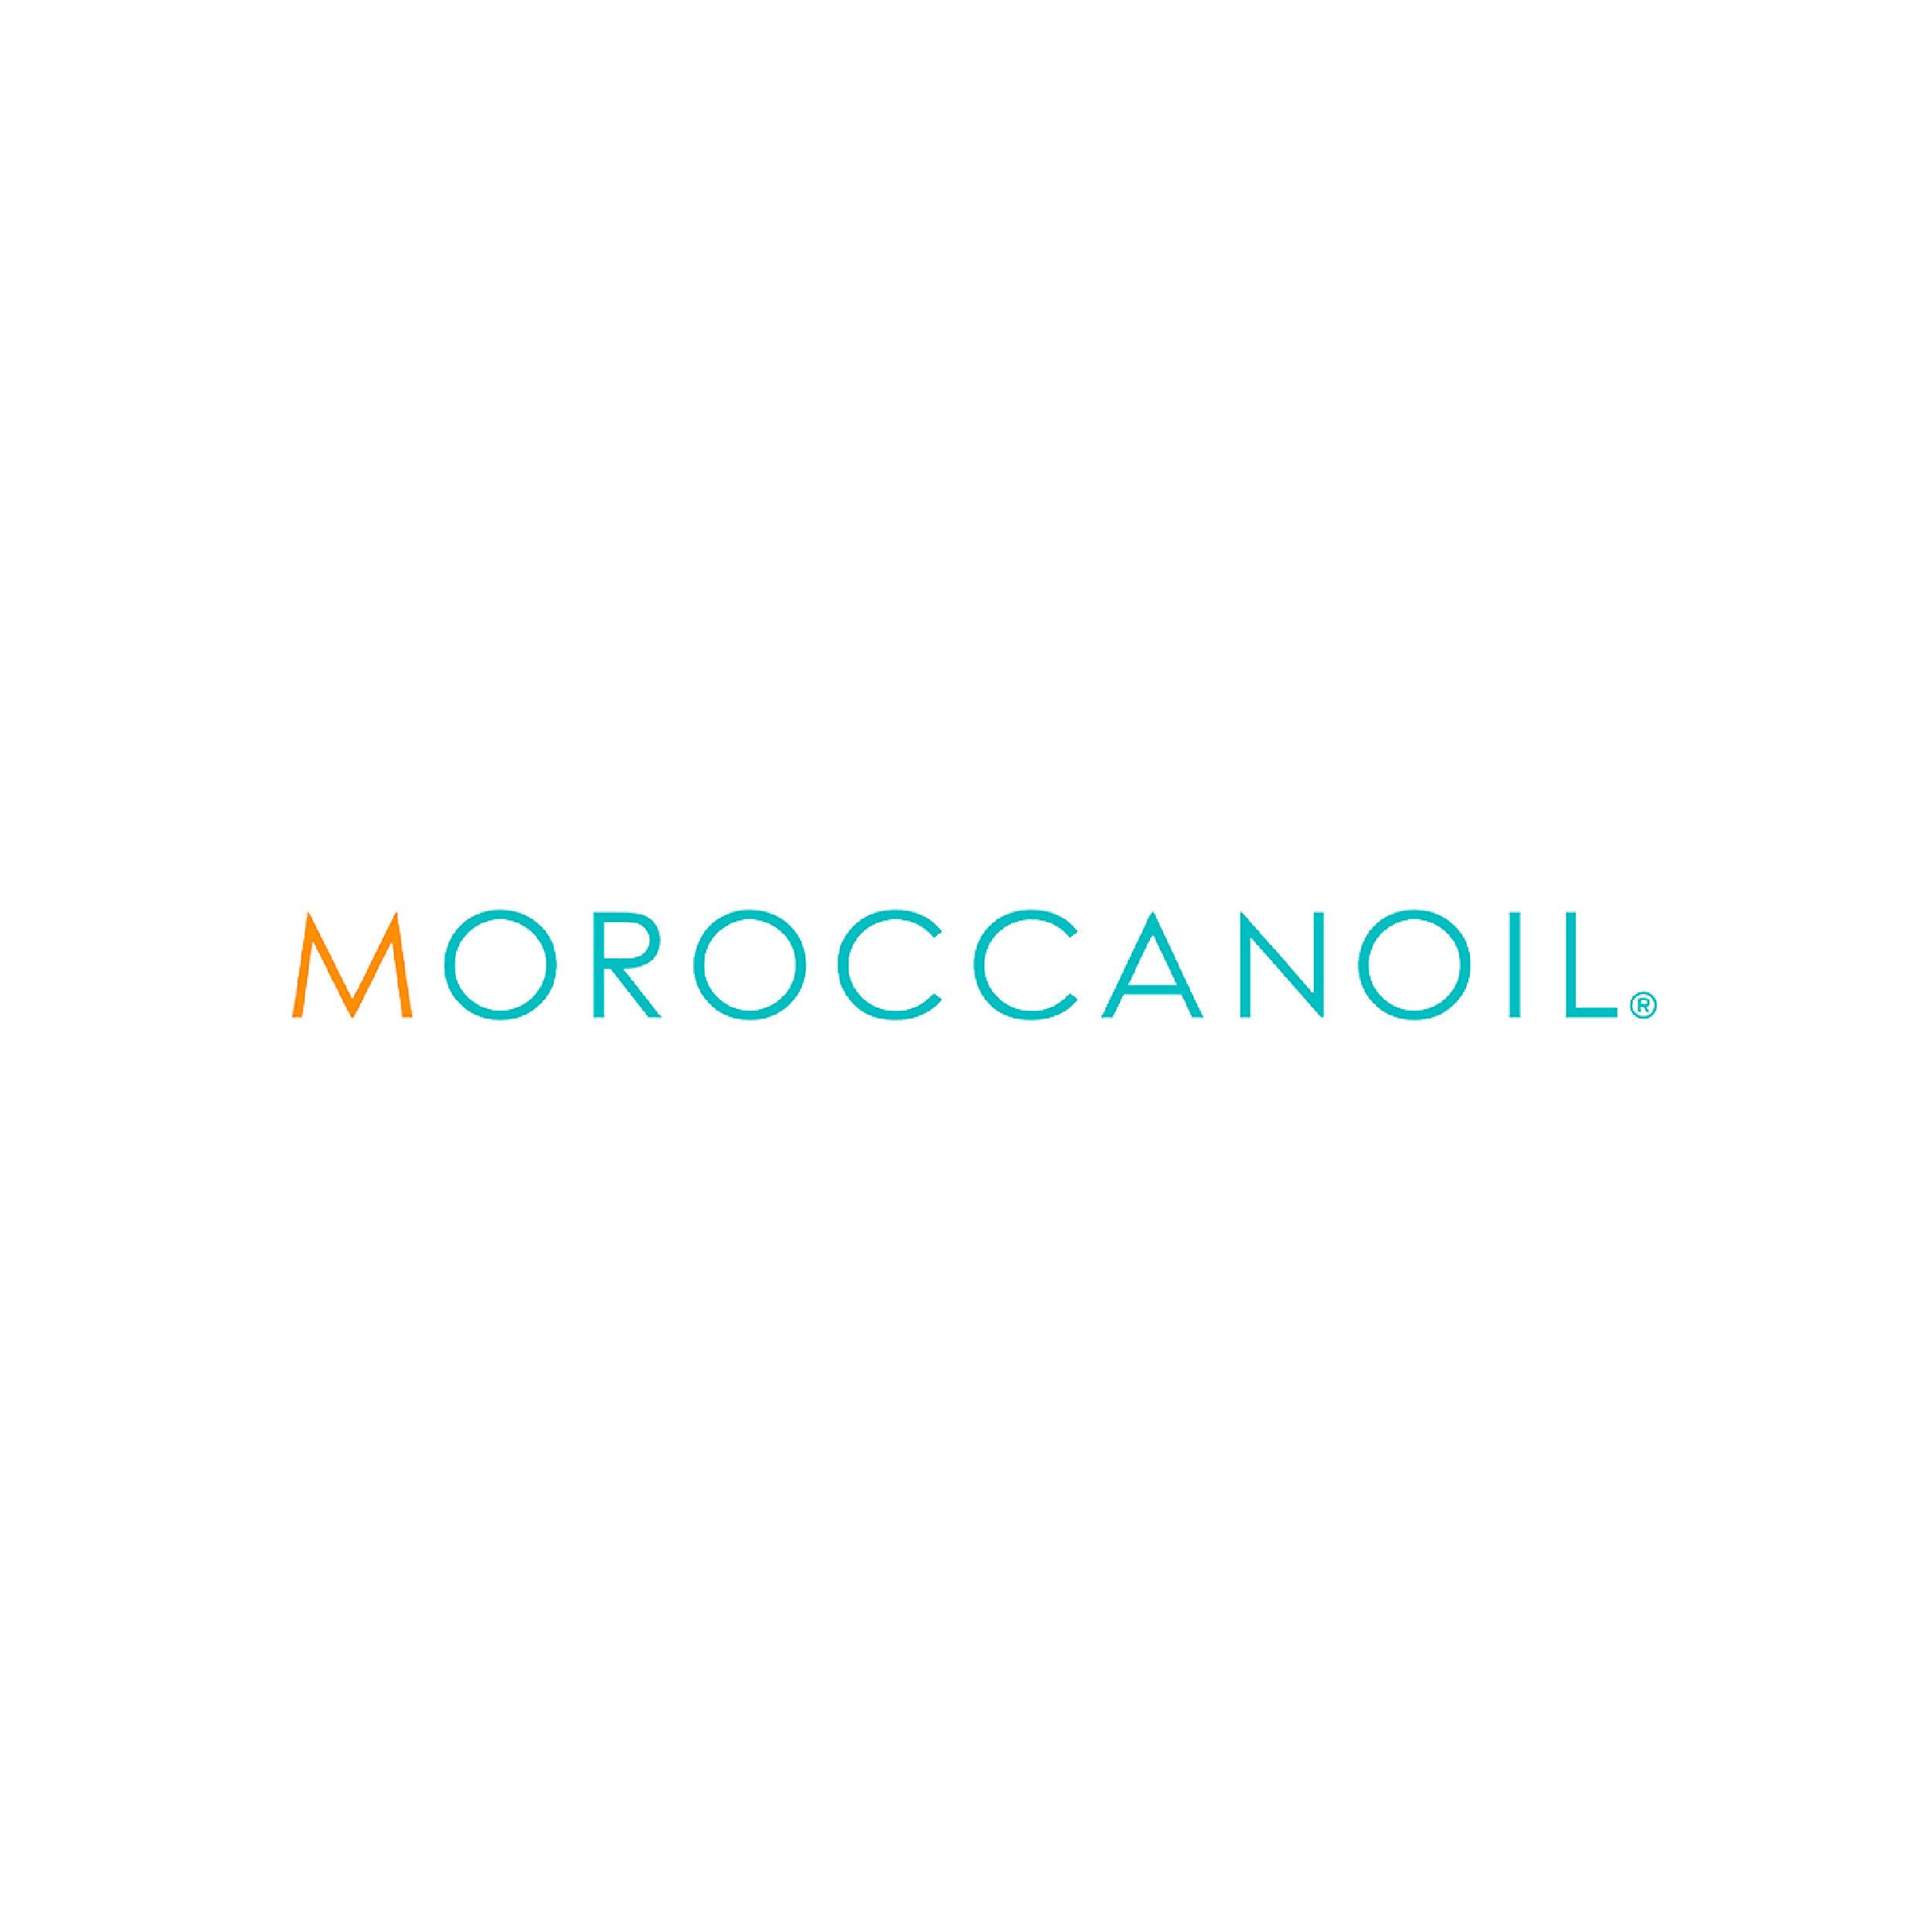 Moroccanoillogo.jpg